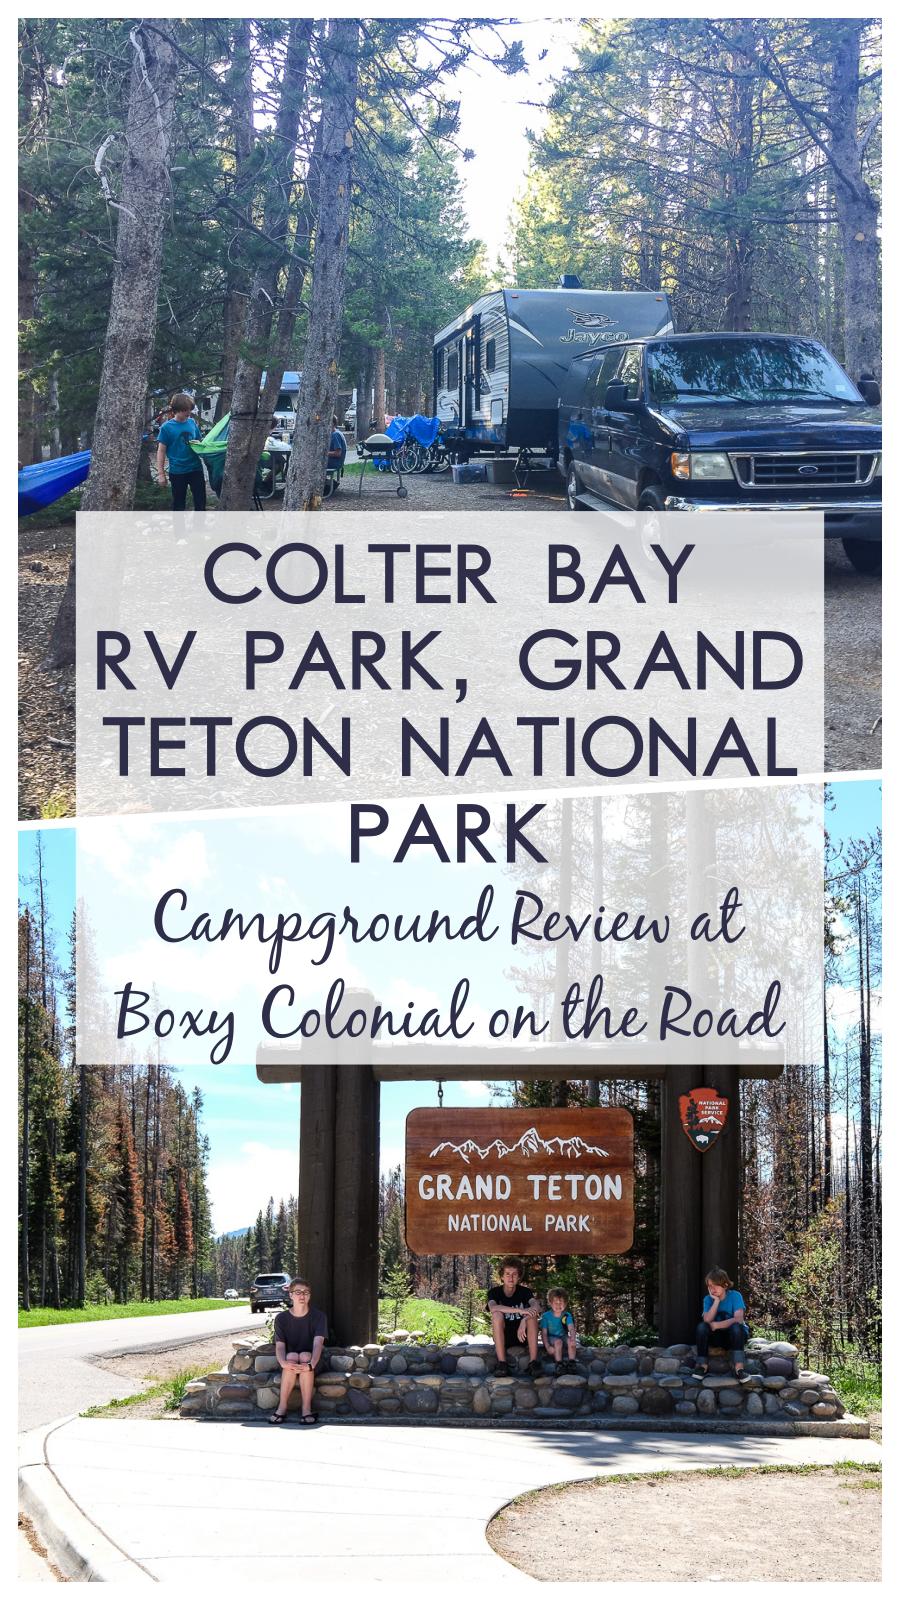 Colter Bay RV Park in Grand Teton National Park